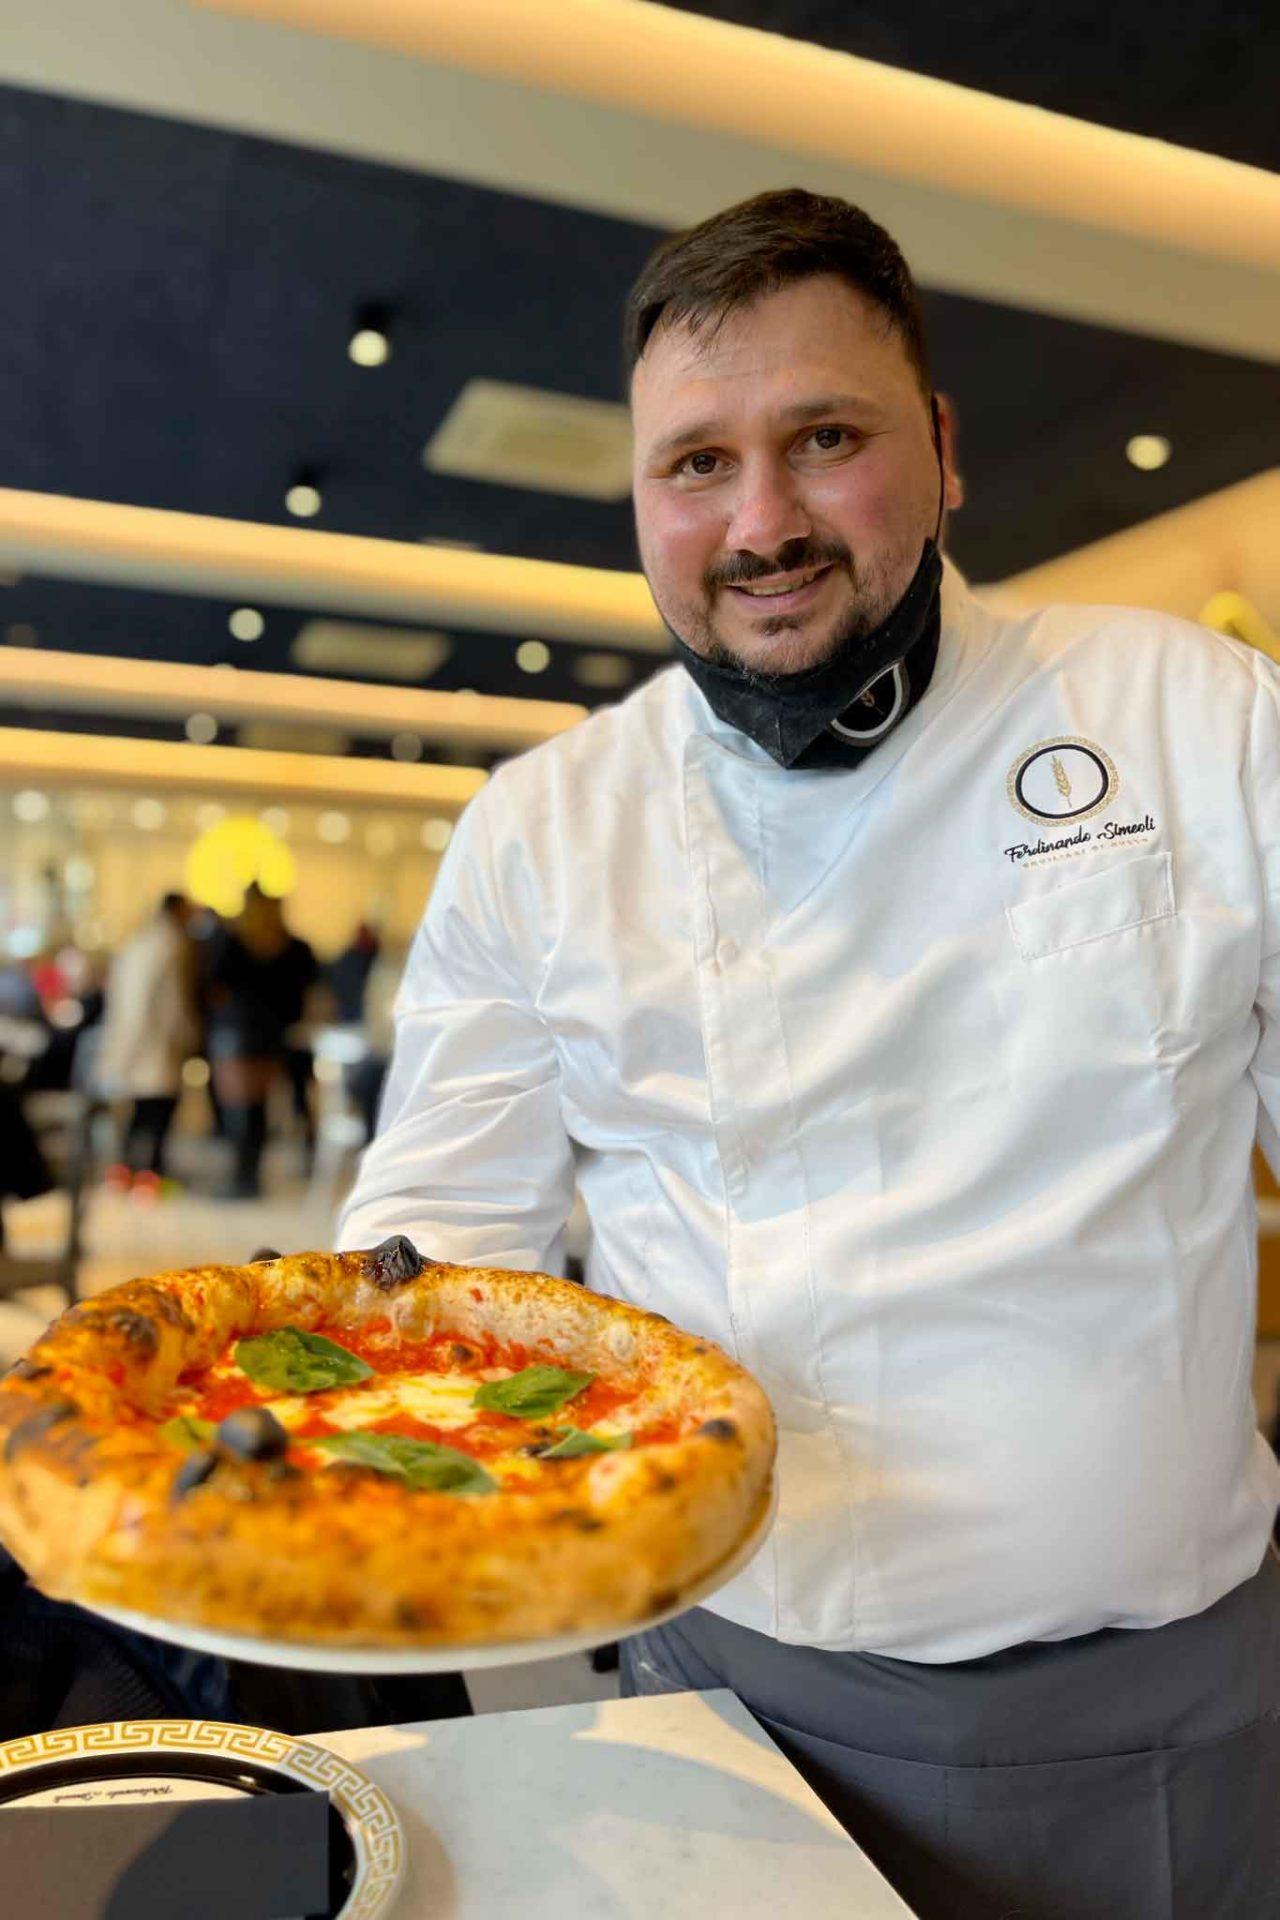 pizza canotto margherita Ferdinando Simeoli